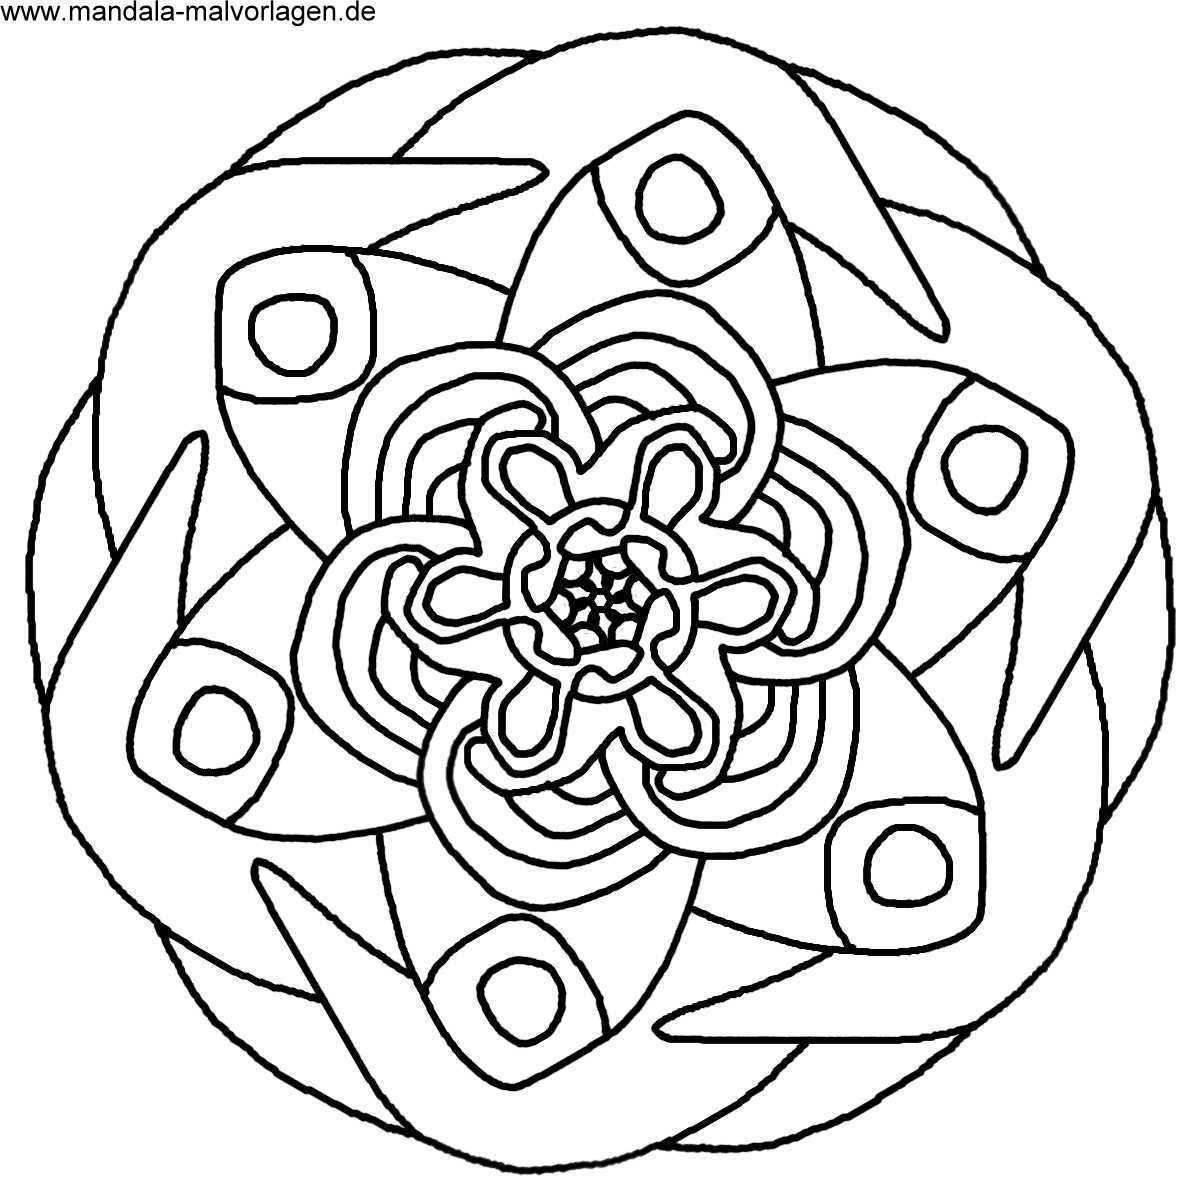 Ausmalbilder Mandala Ausmalbilder Mandalas Ausmalbilder Mandala Ausmalbilder Mandala Tiere Ausdrucken